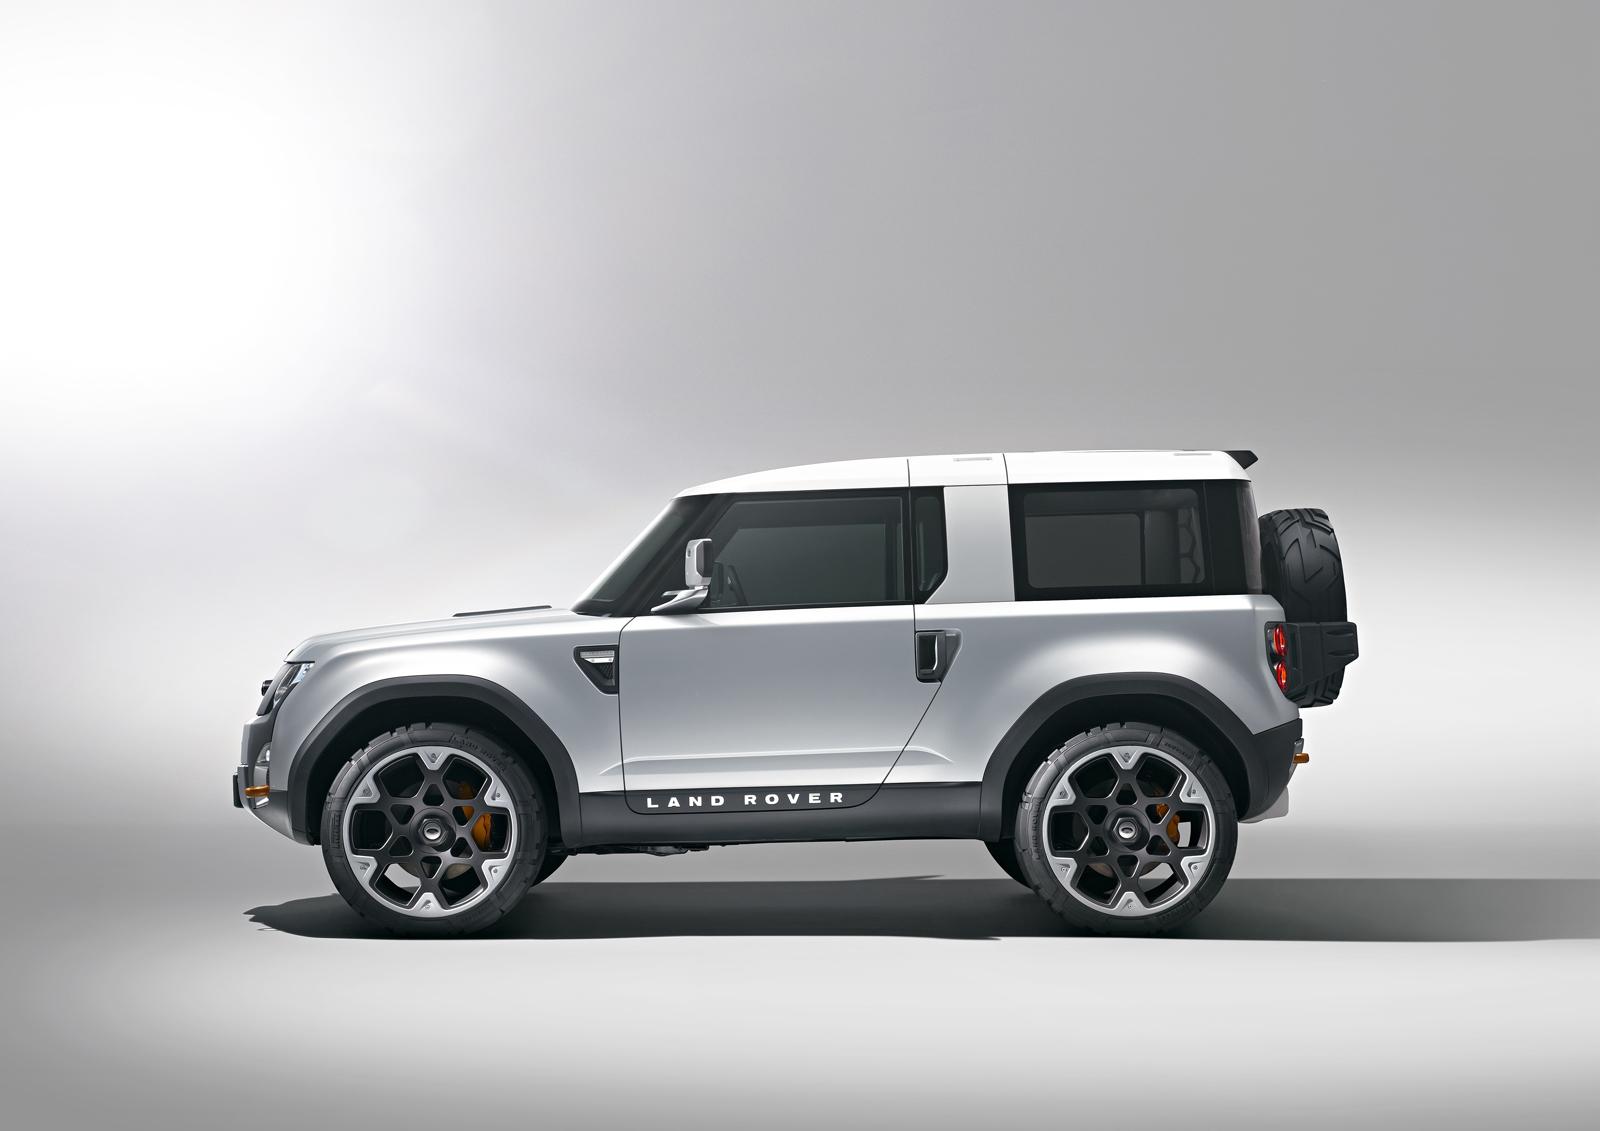 vehicles dx landrover device new en rover range index mena land suv luxury desktop